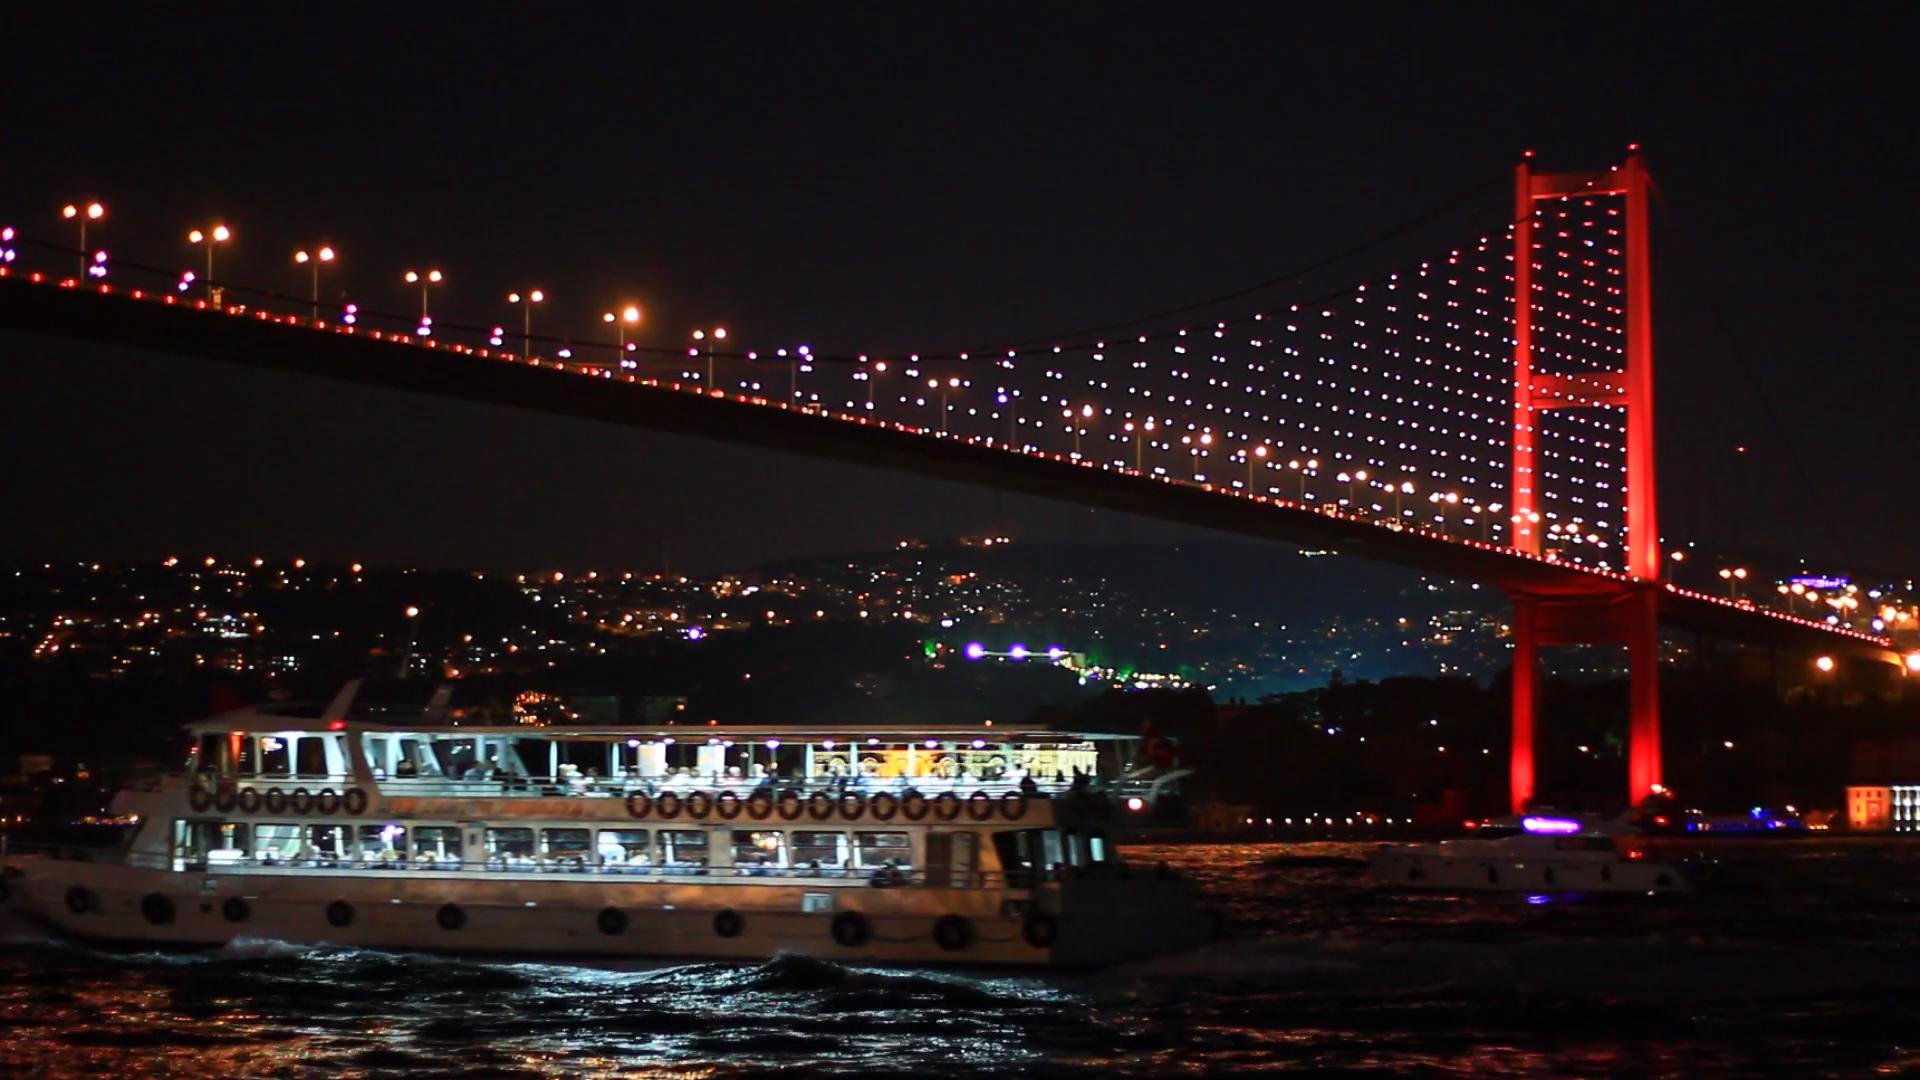 Bosphorus Bridge nightly light show in Istanbul, Turkey. Bosporus ...